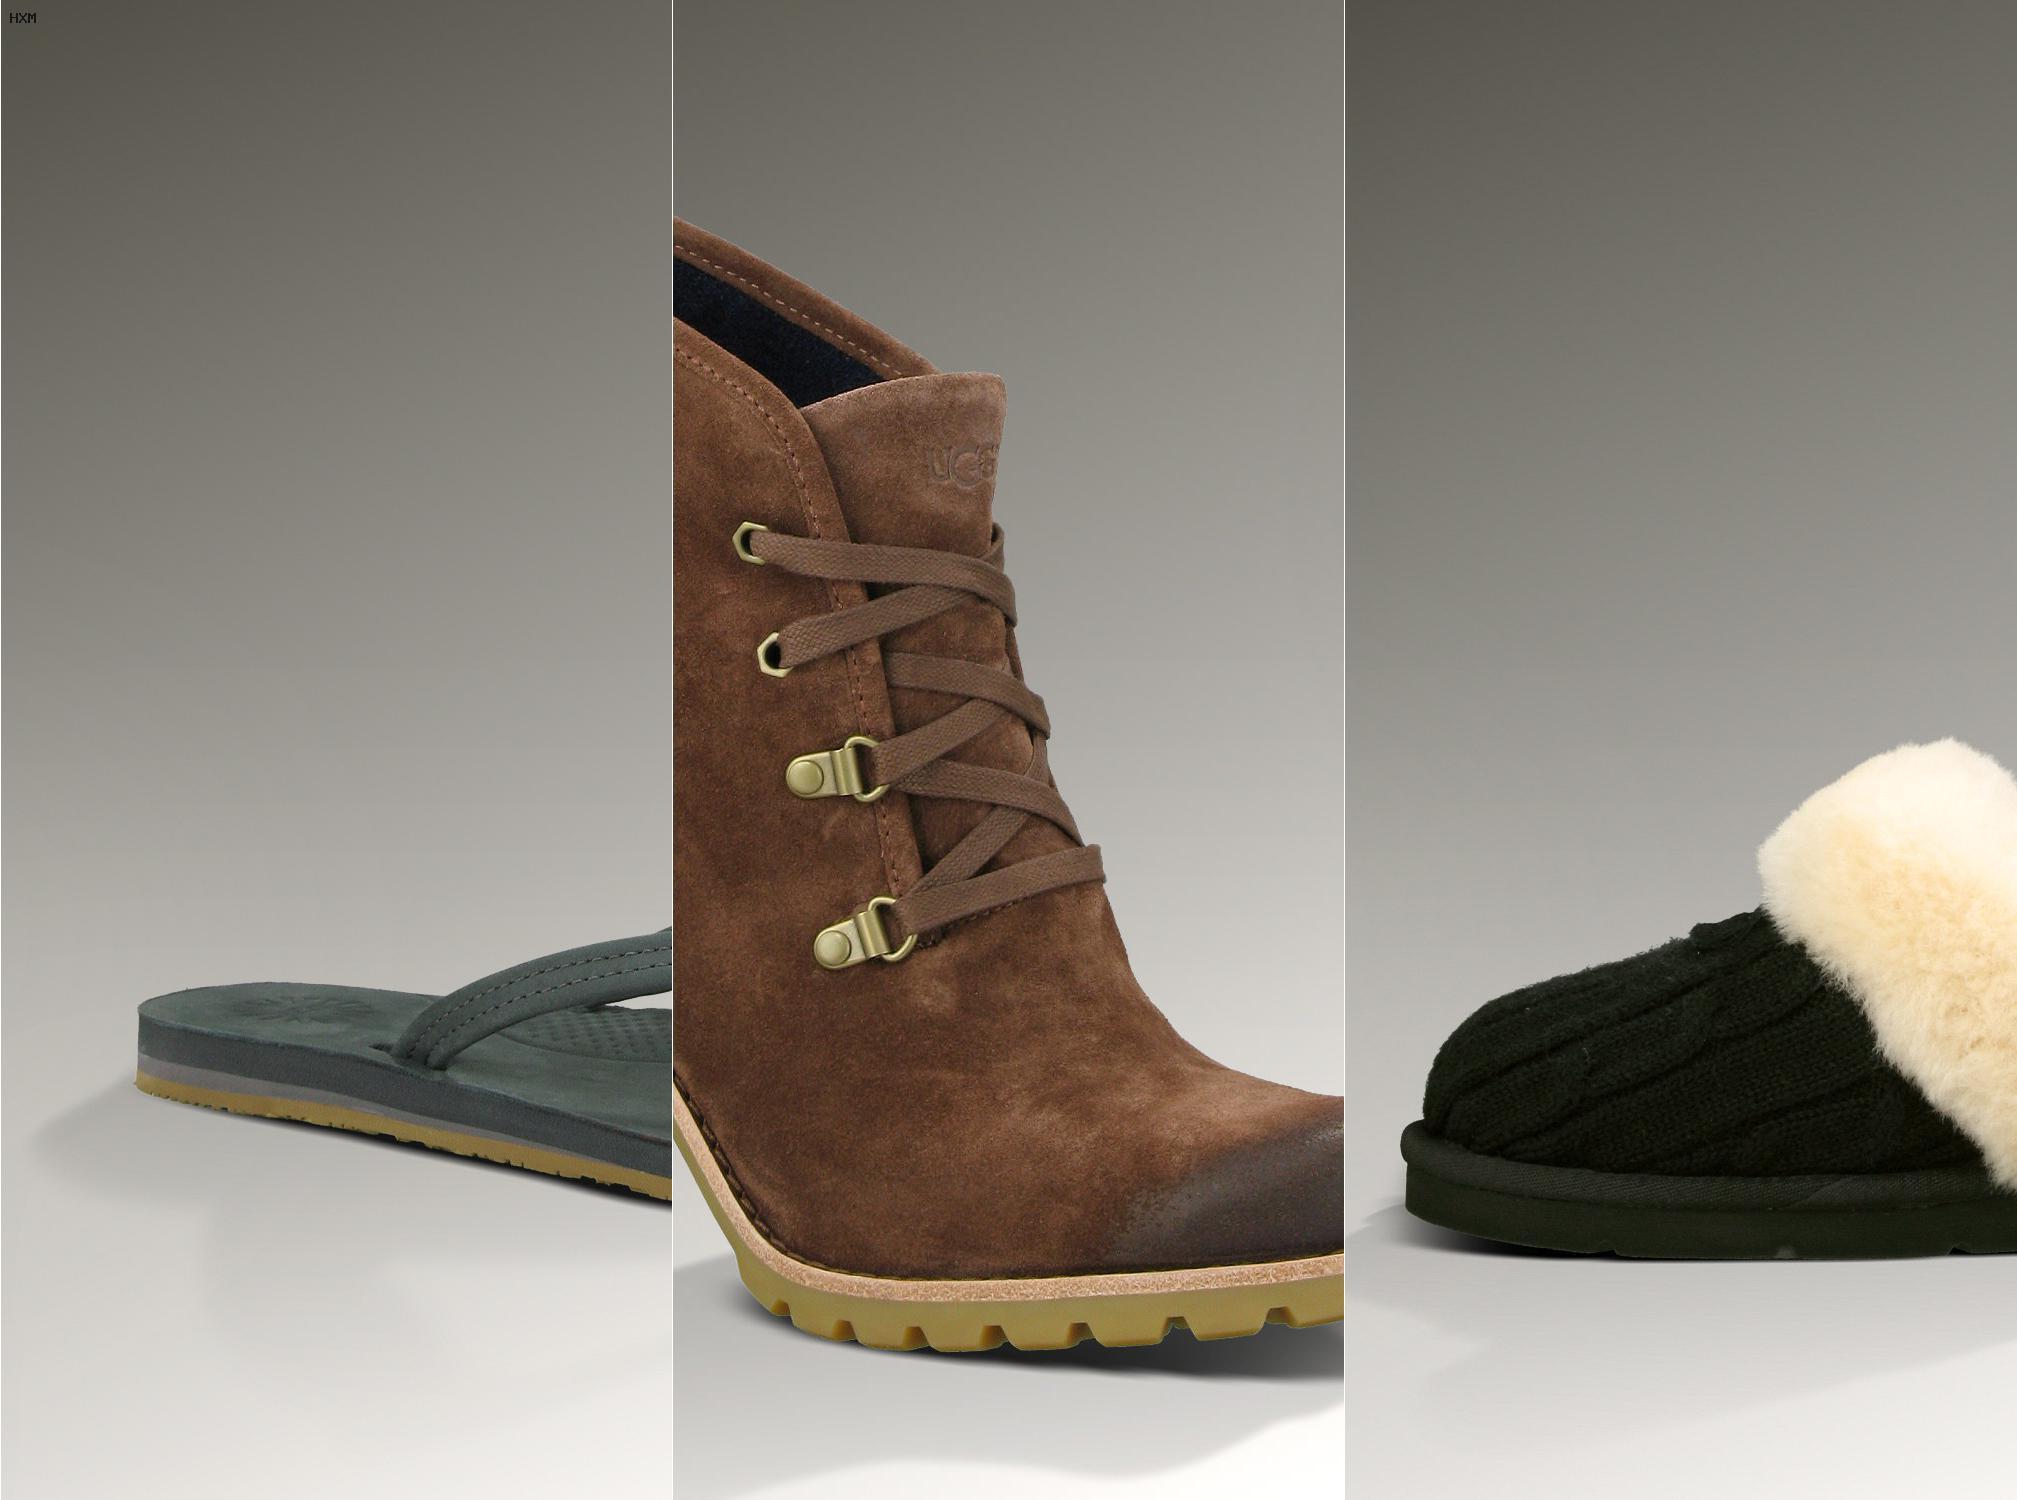 ugg boots basel